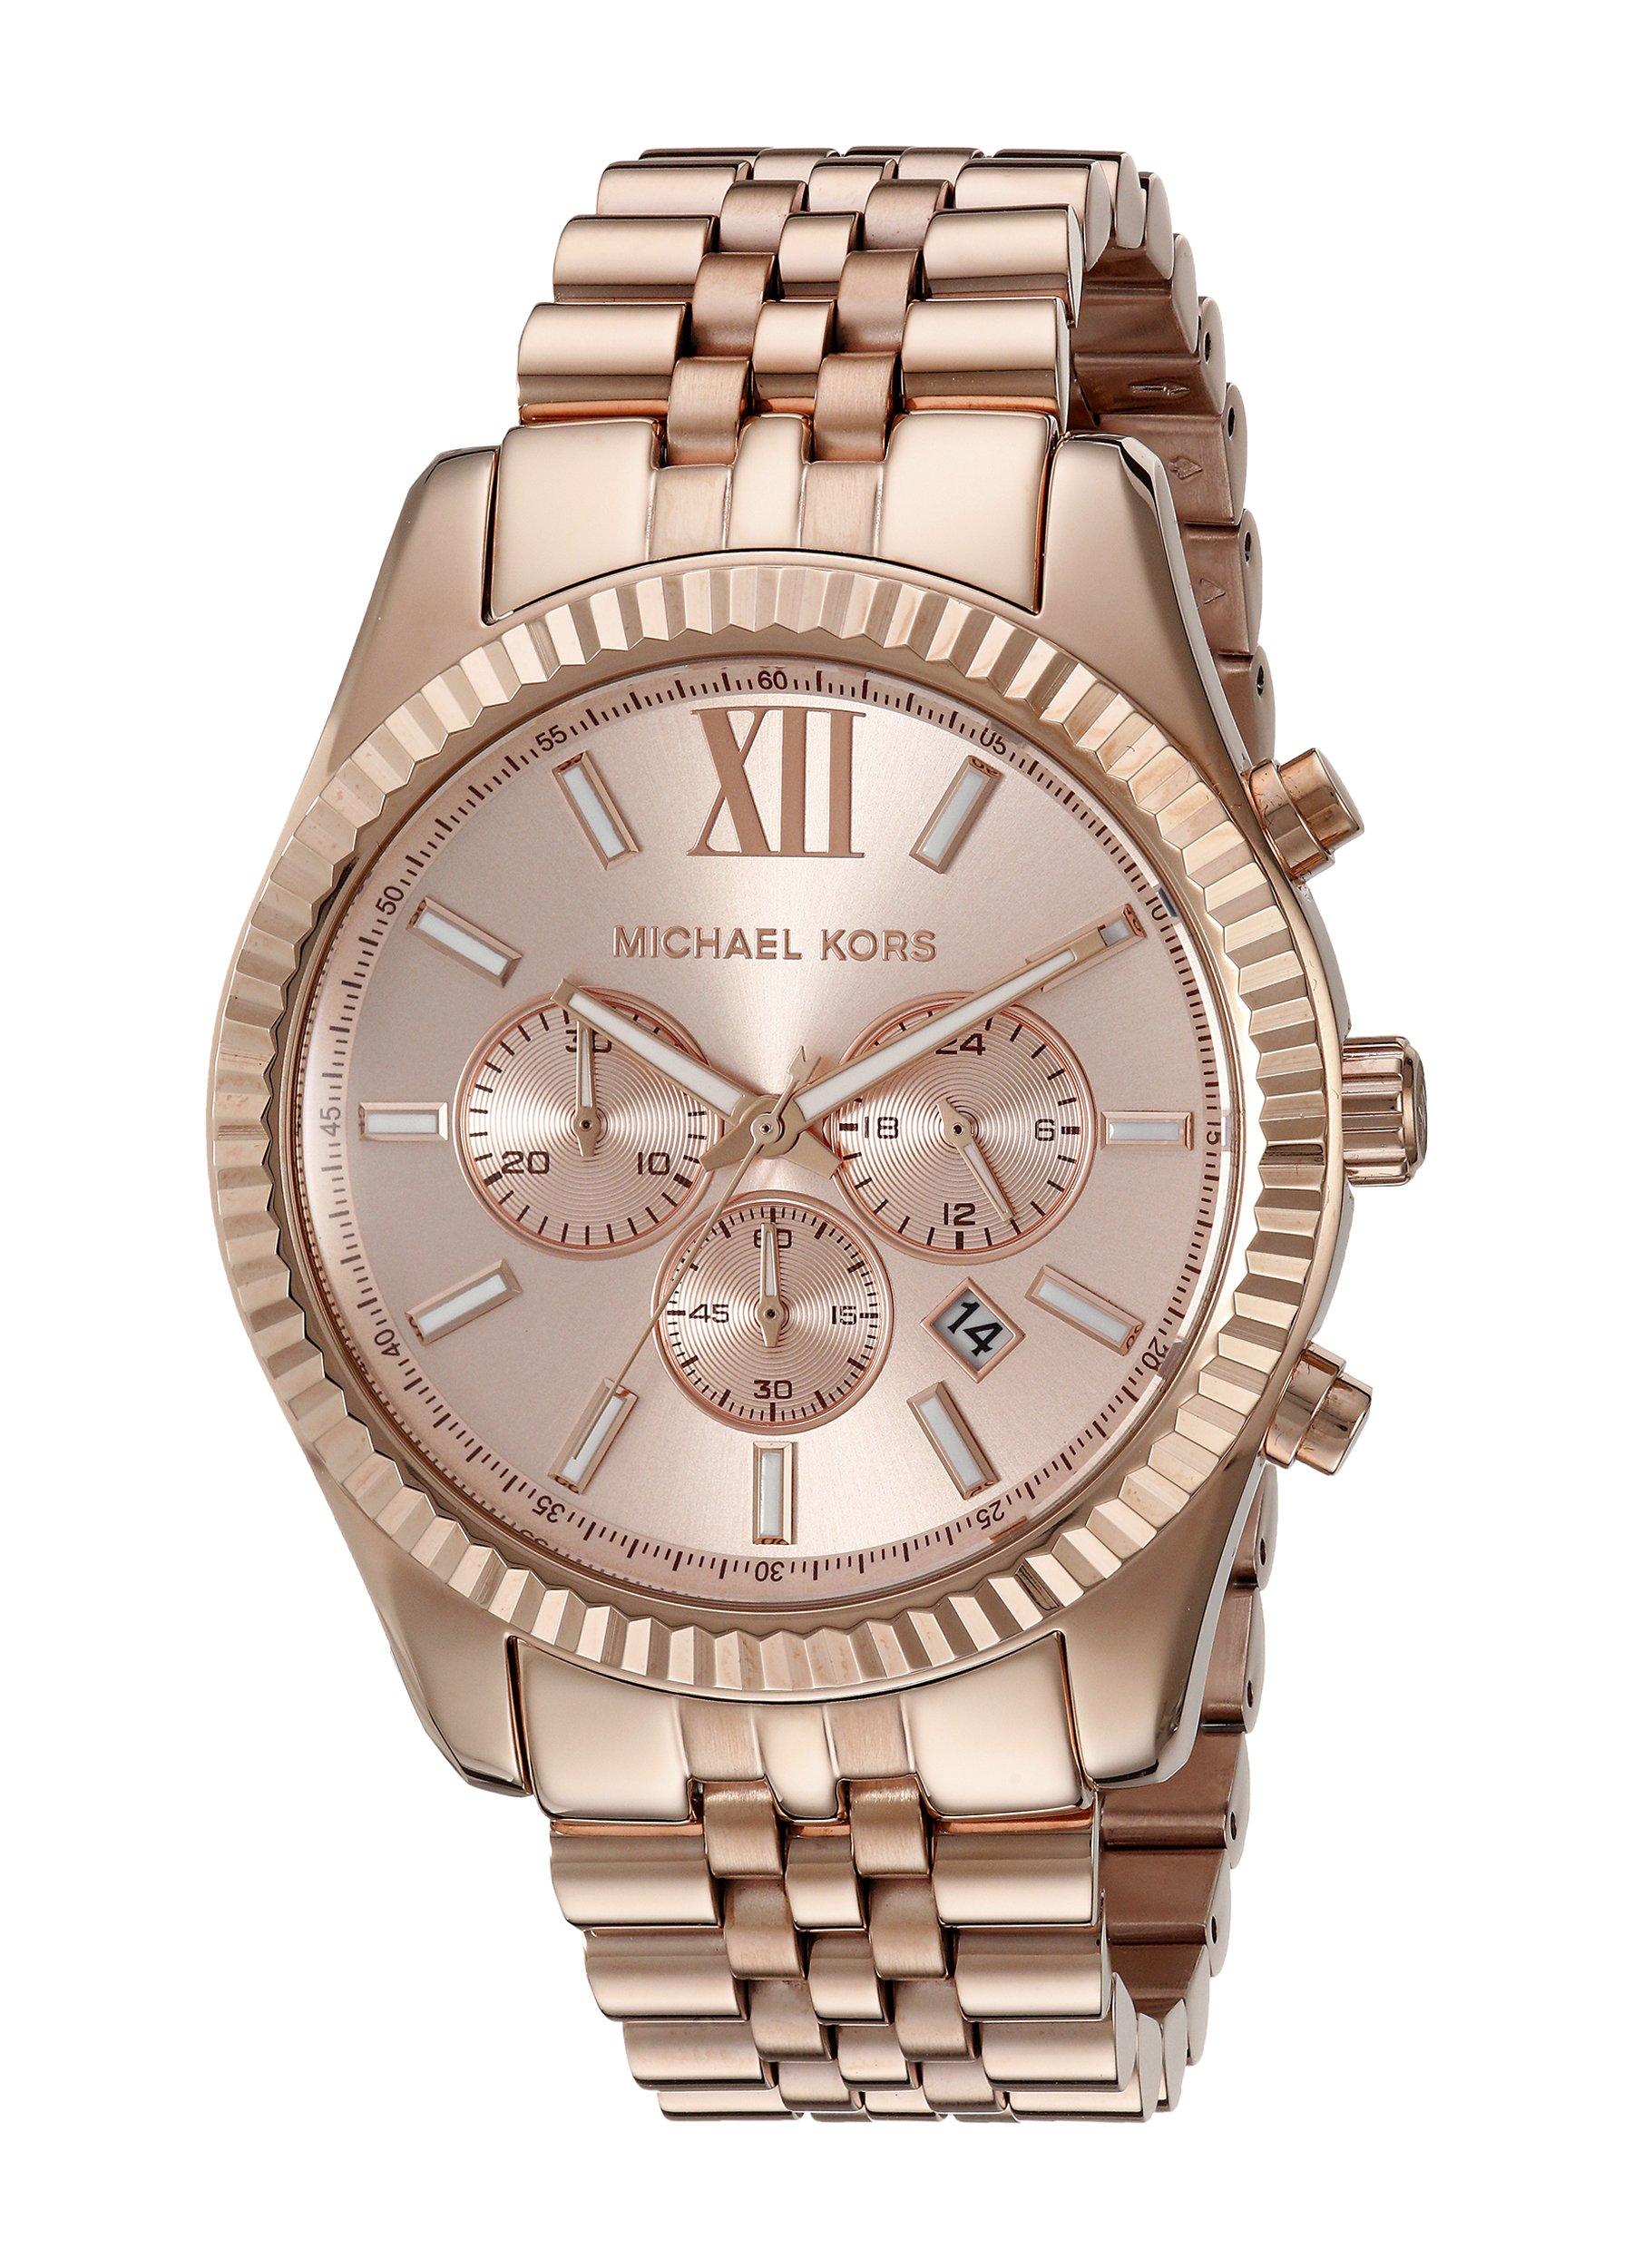 Michael Kors Oversize Rose Golden Stainless Steel Lexington Chronograph Women's watch #MK8319 by Michael Kors